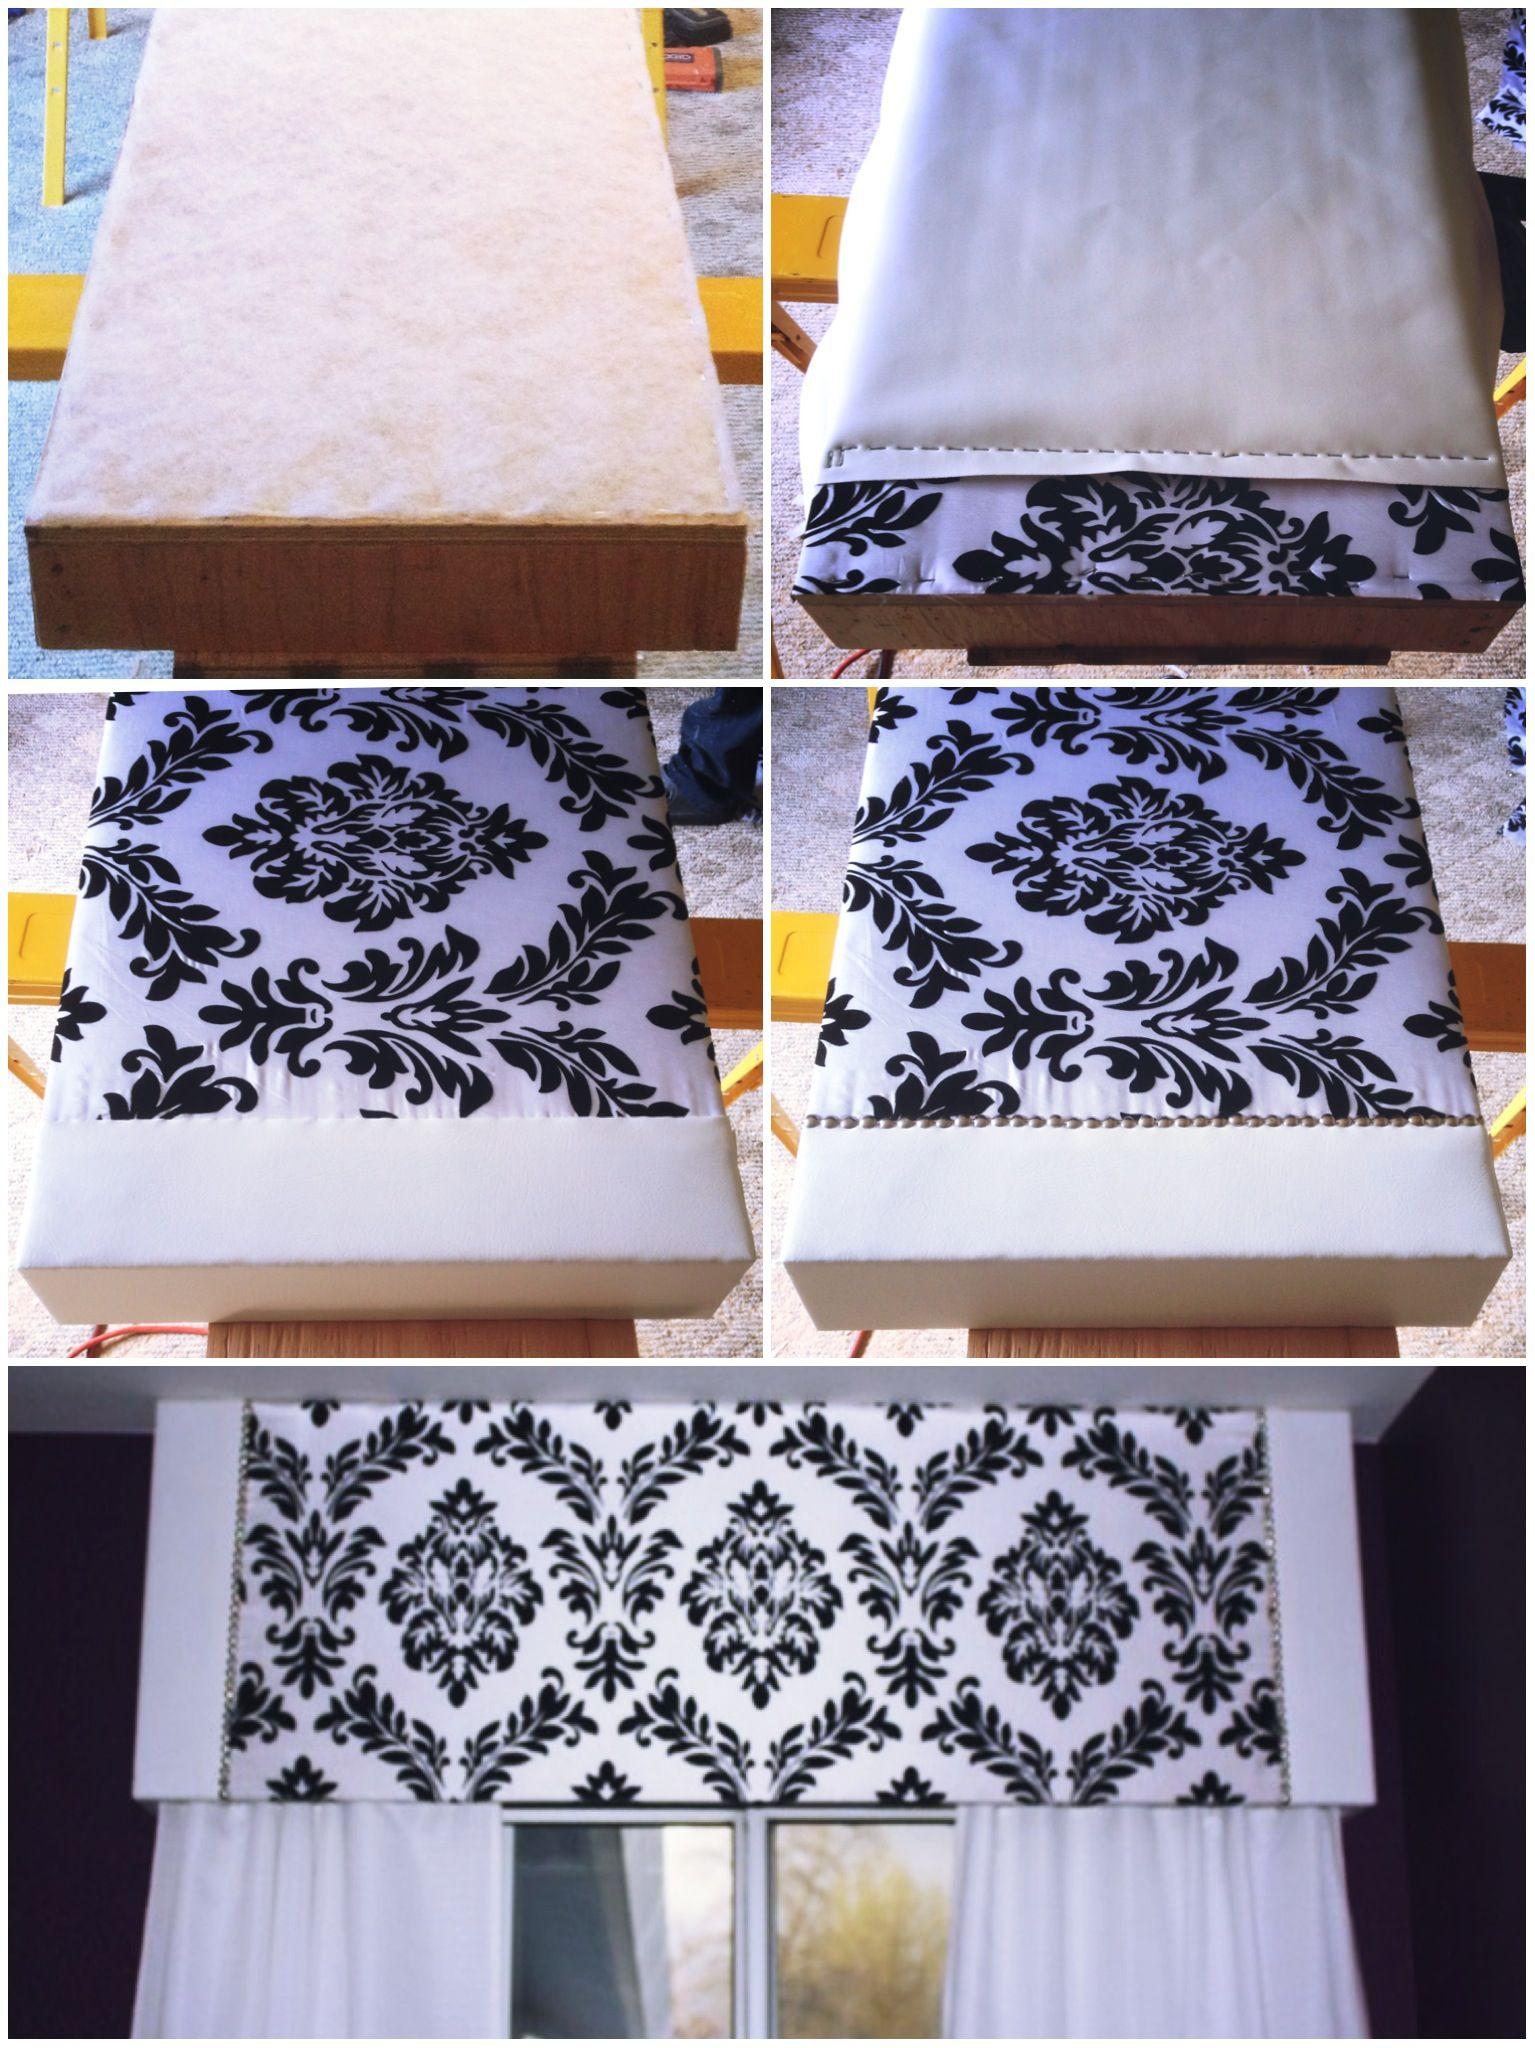 Diy valancepelmet box damask pattern damask bedding